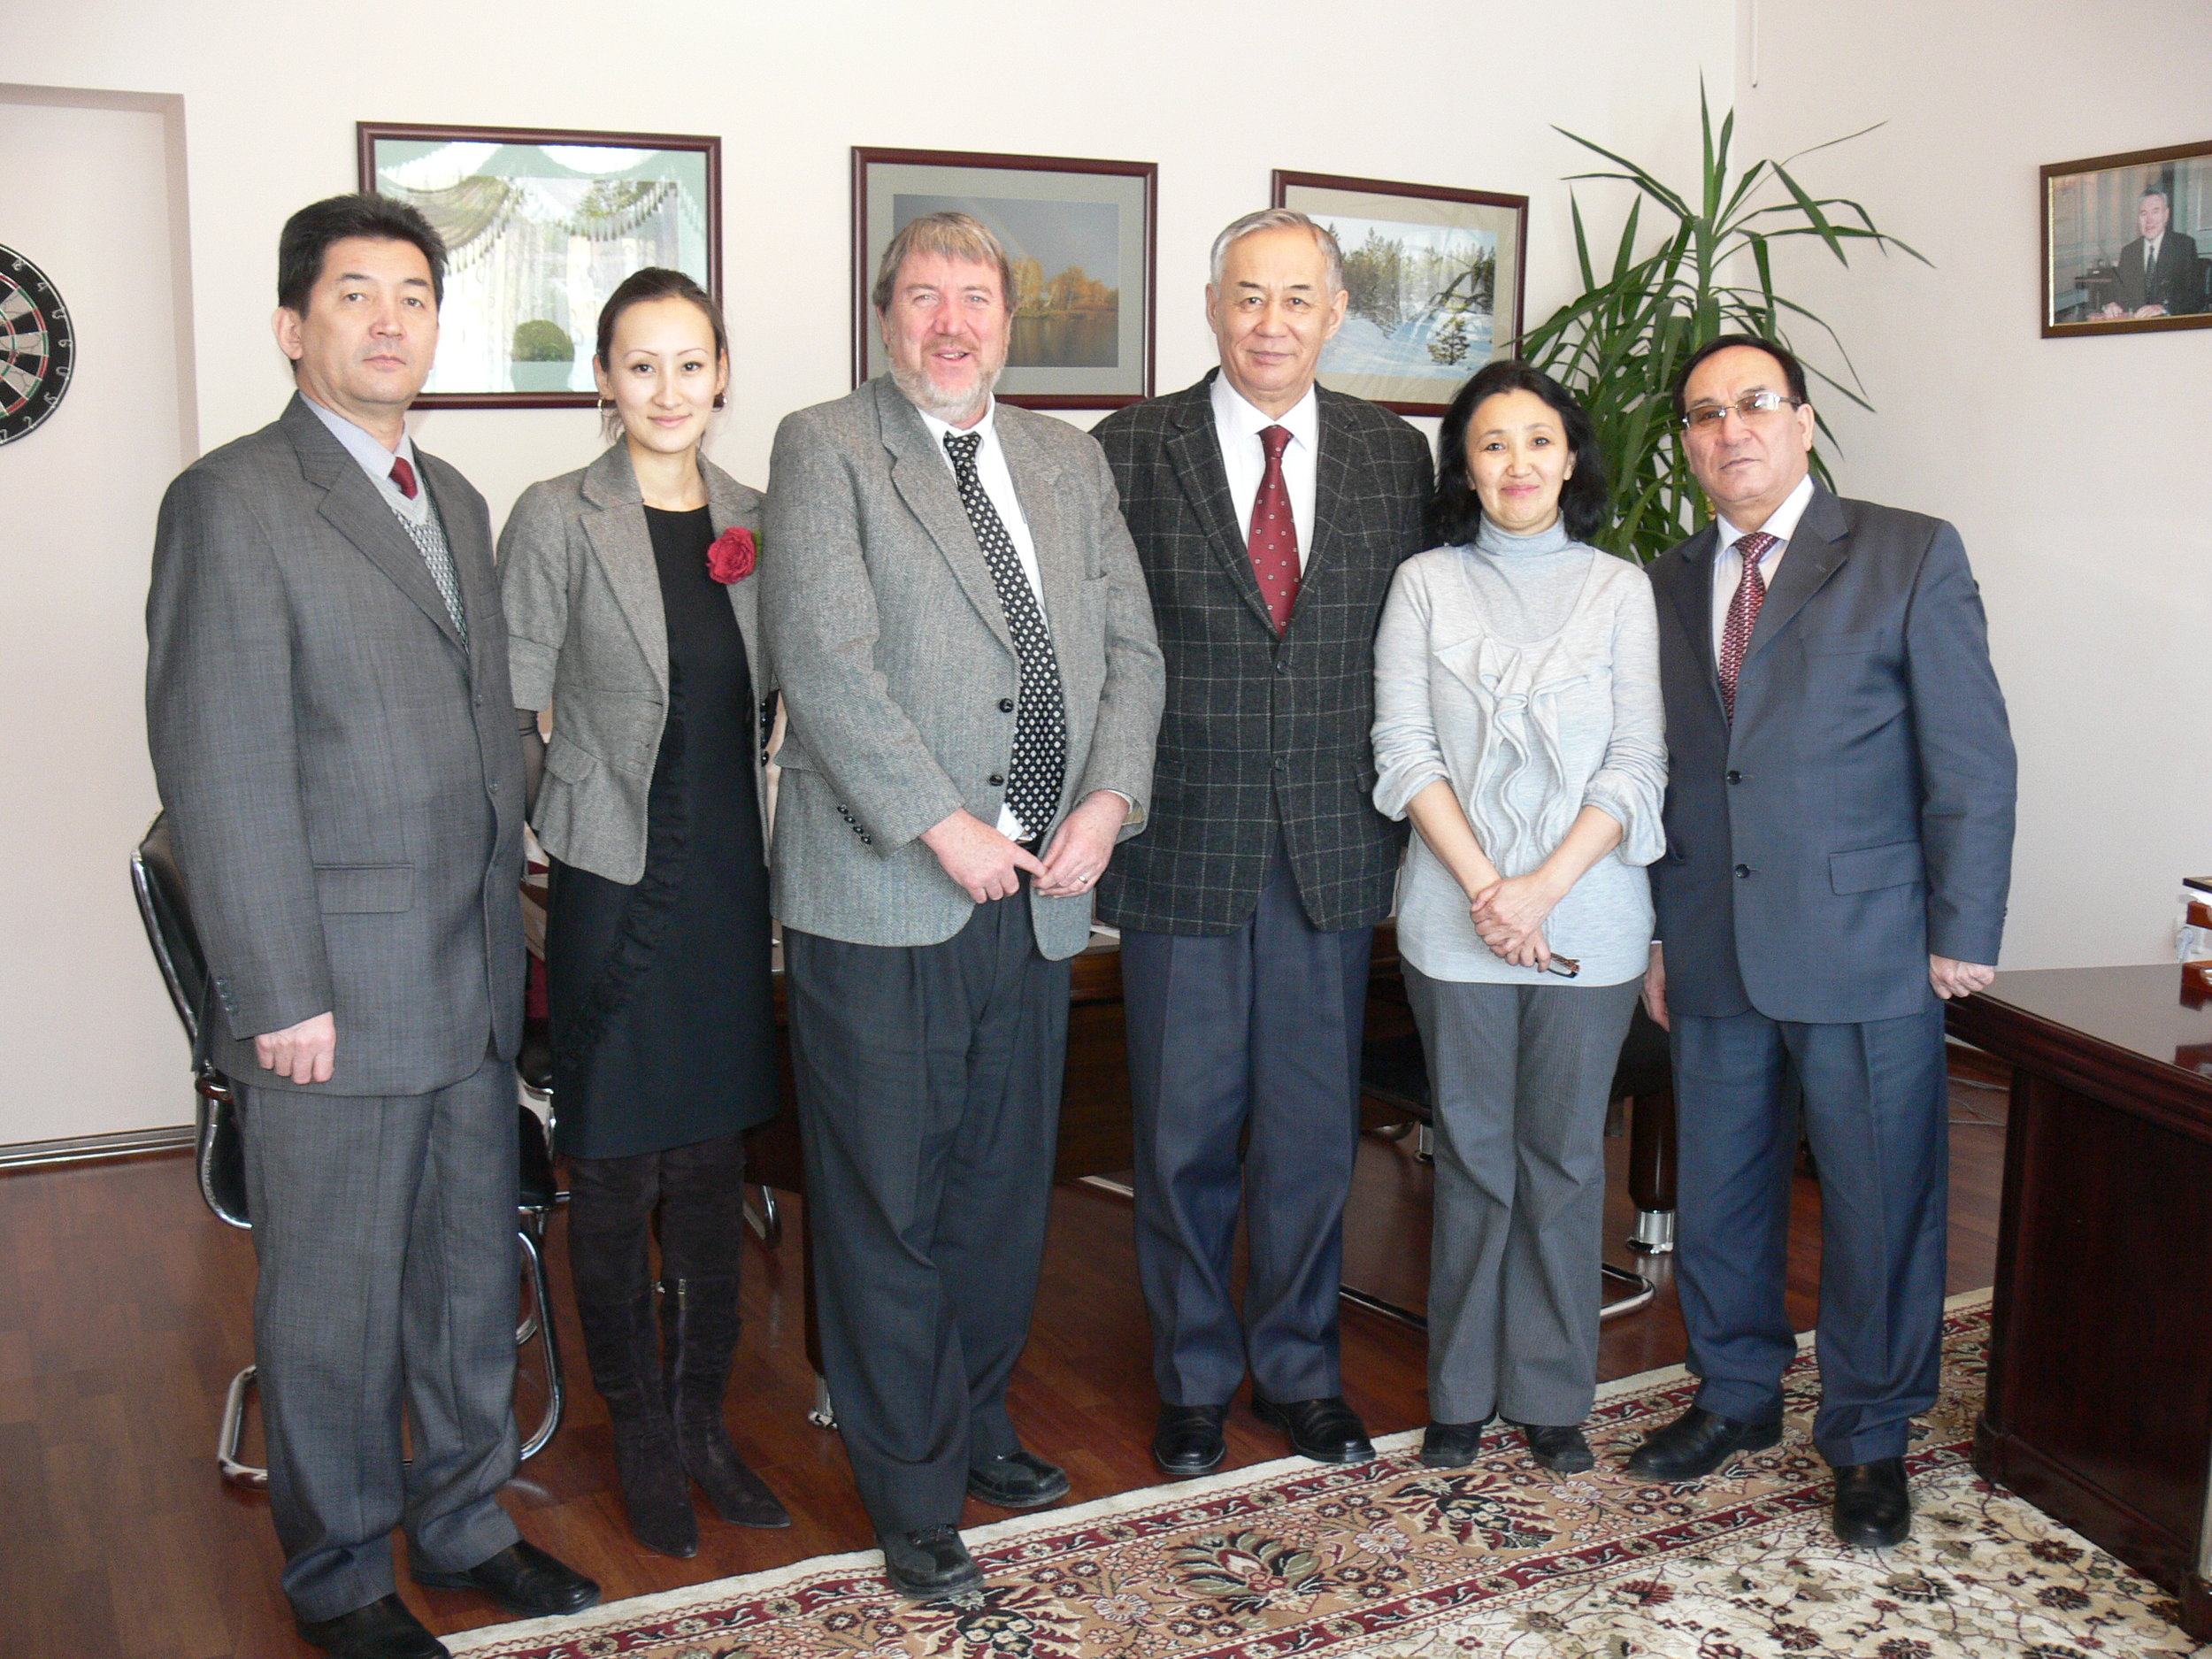 At Semey State University, Kazakhstan, March 2011